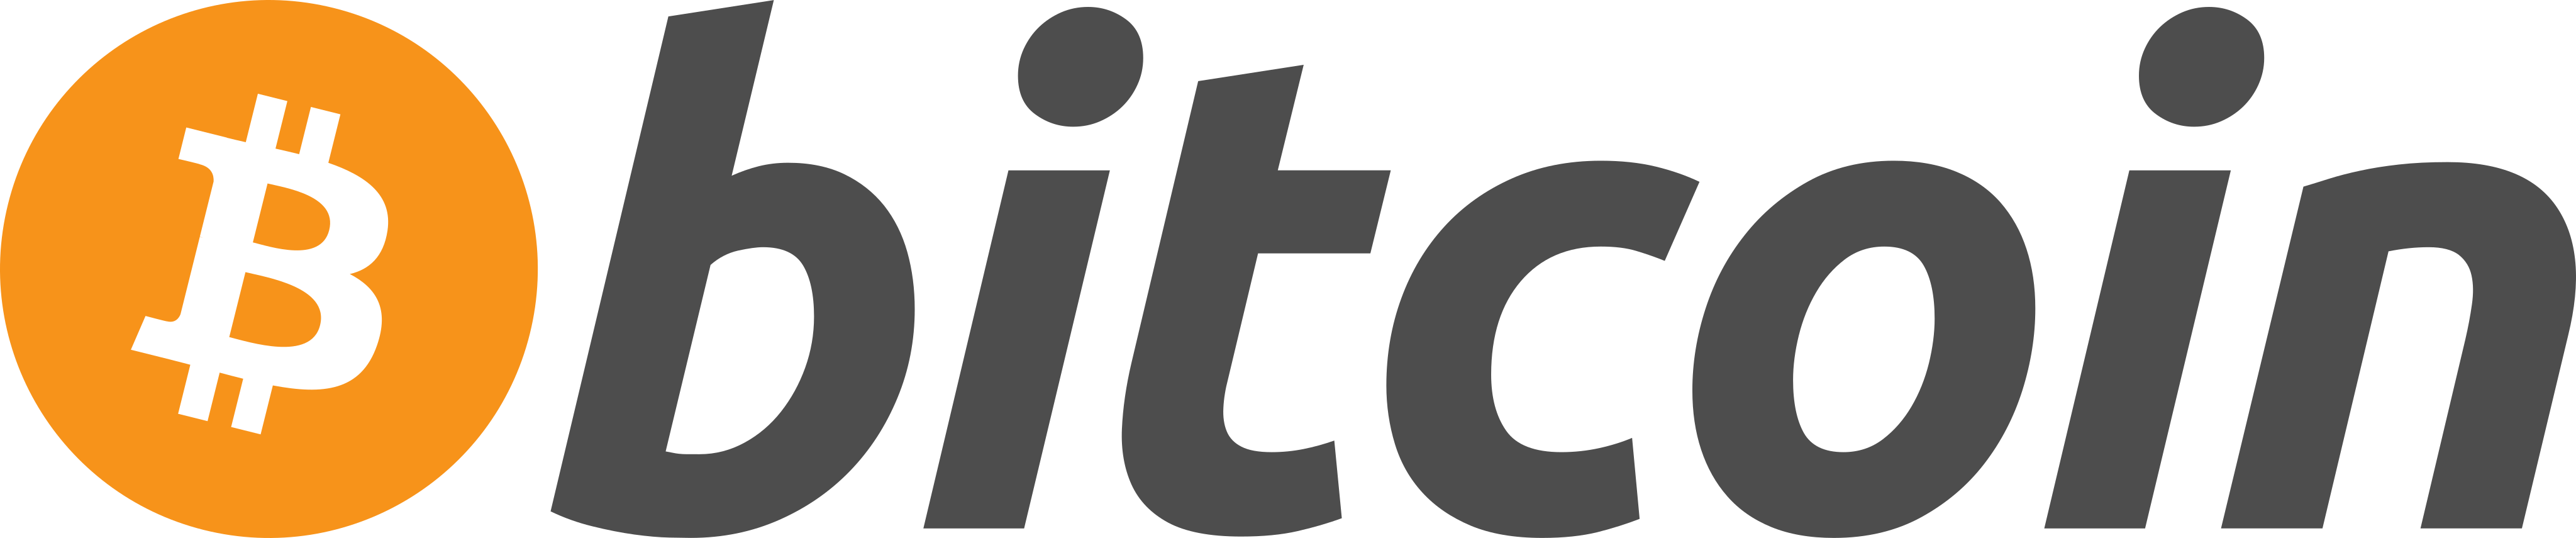 bitcoin logo 8 - Bitcoin Logo